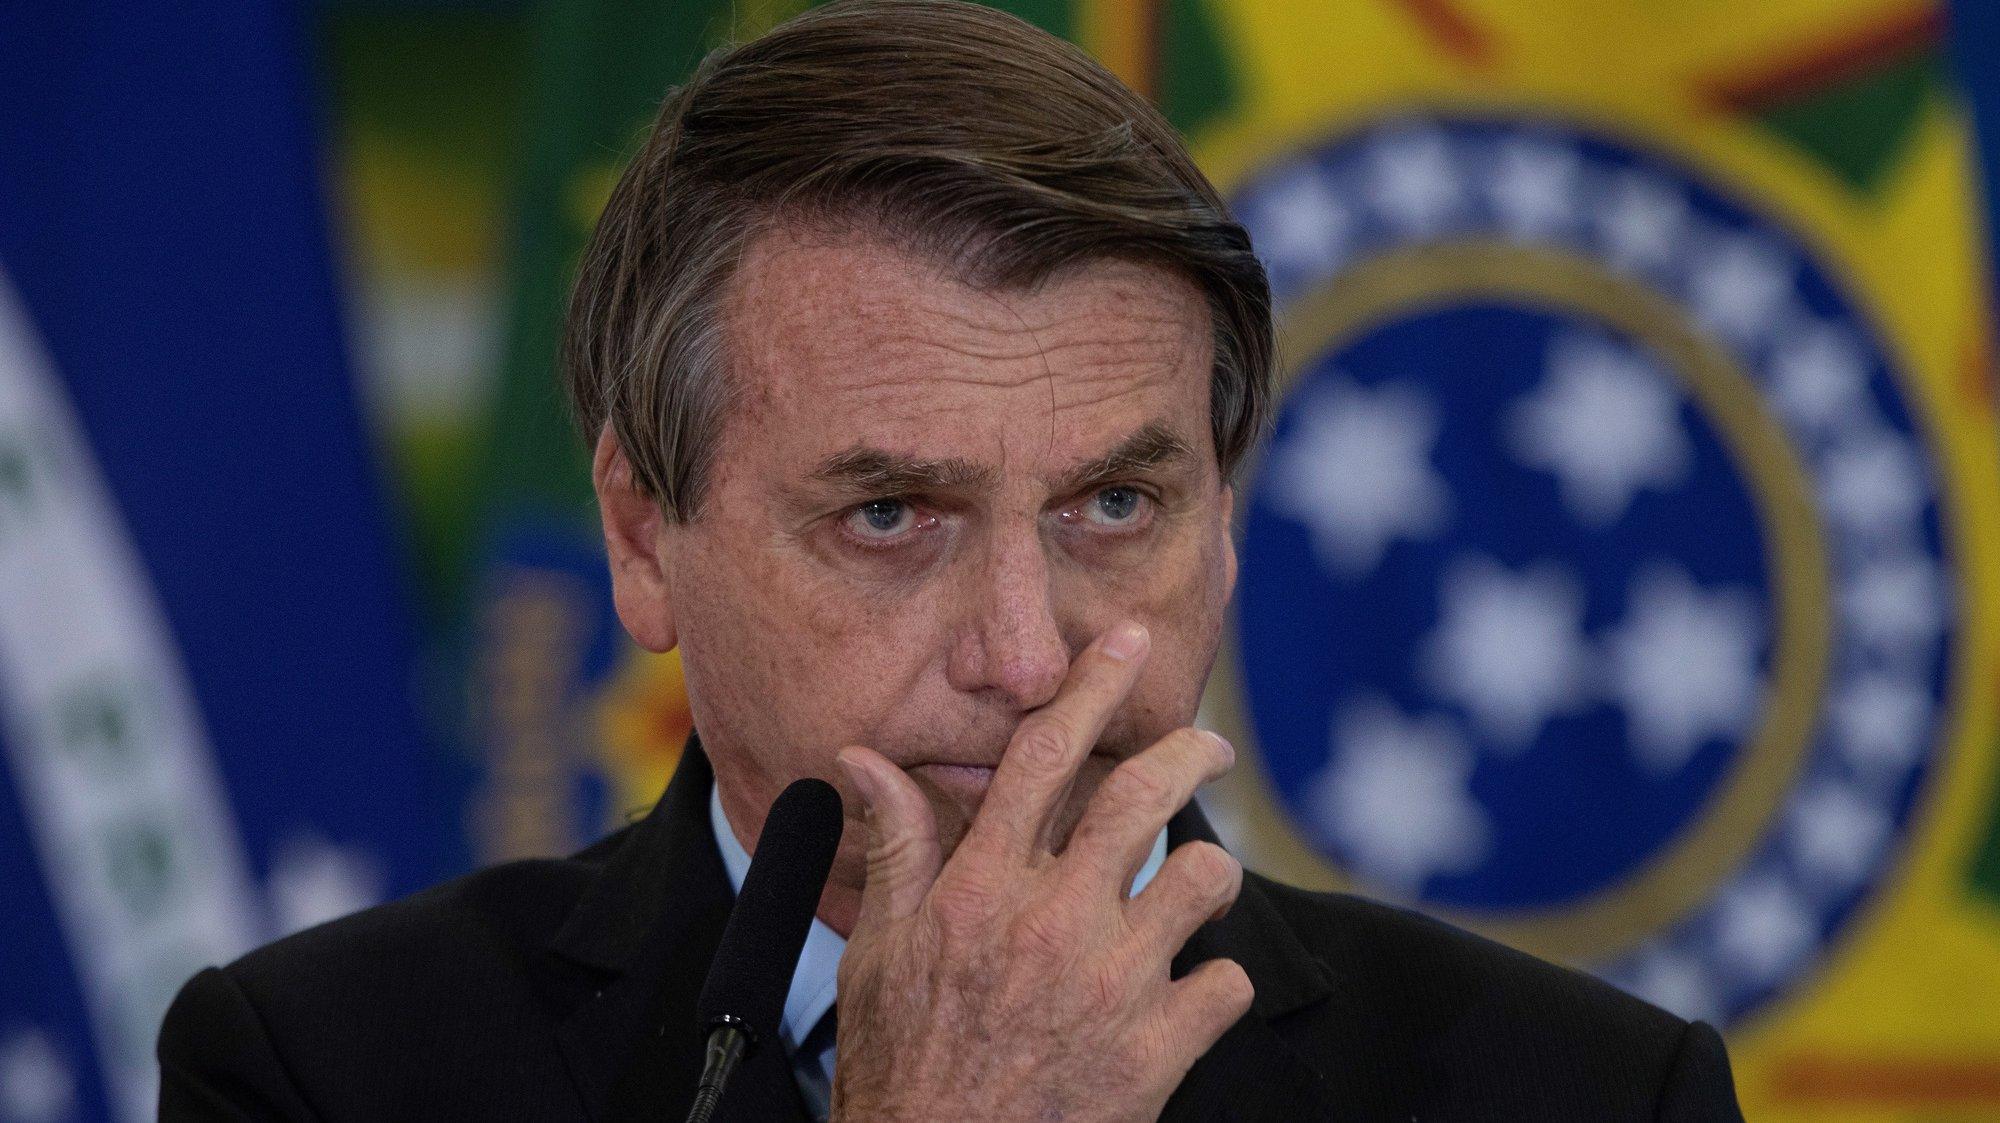 epa09097687 Brazil's president Jair Bolsonaro participates in the announcement of CAIXA's new measures to support Santas Casas and Hospitales Filantropicos, at the Palacio do Planalto in the city of Brasilia, Brazil, 25 March 2021.  EPA/Joedson Alves